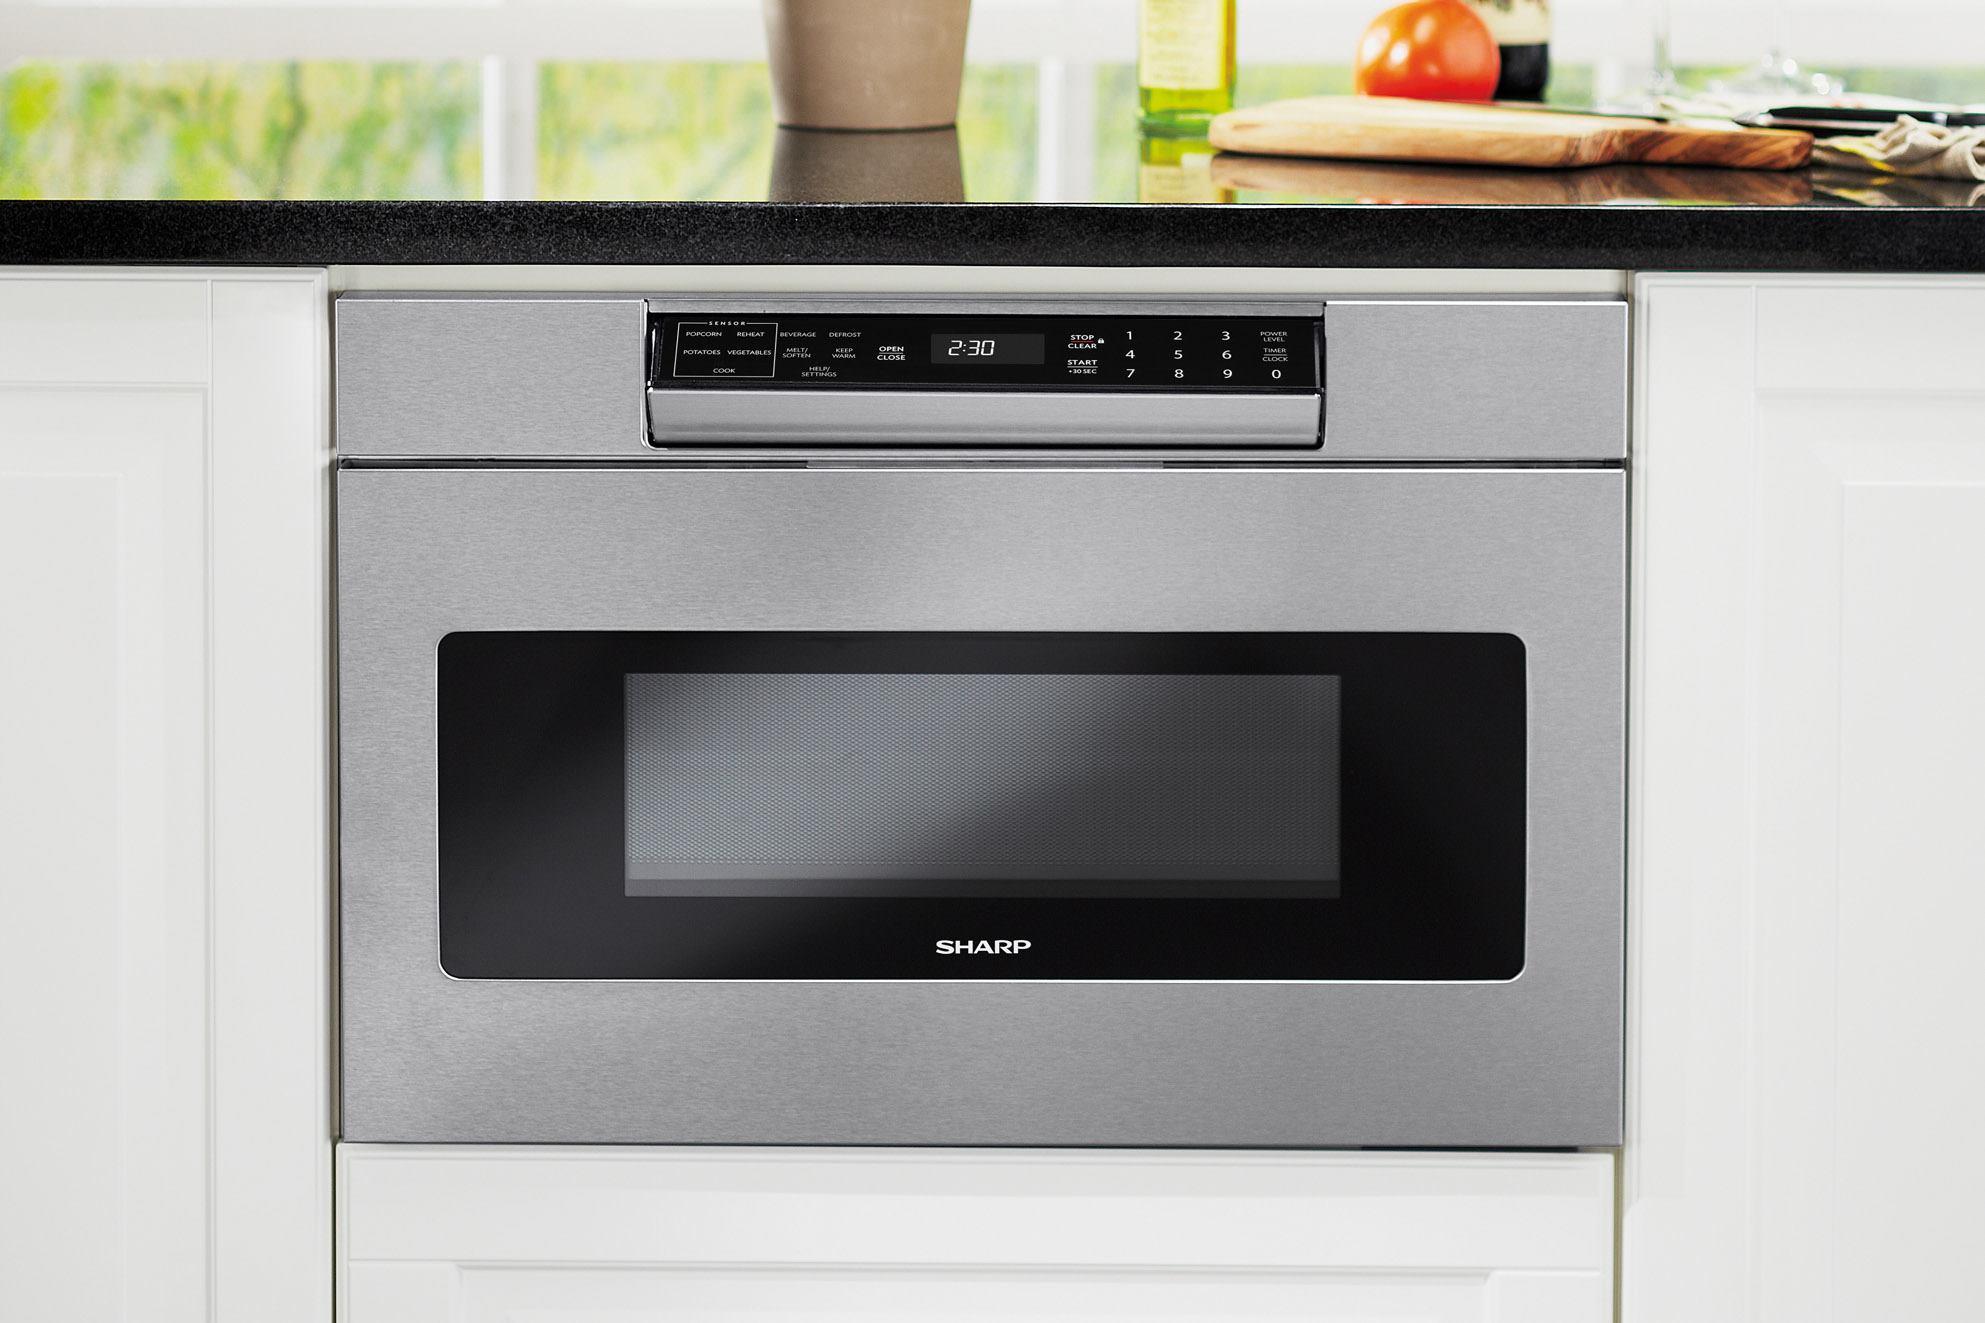 Sharp Microwave Drawer Oven Jlc Online